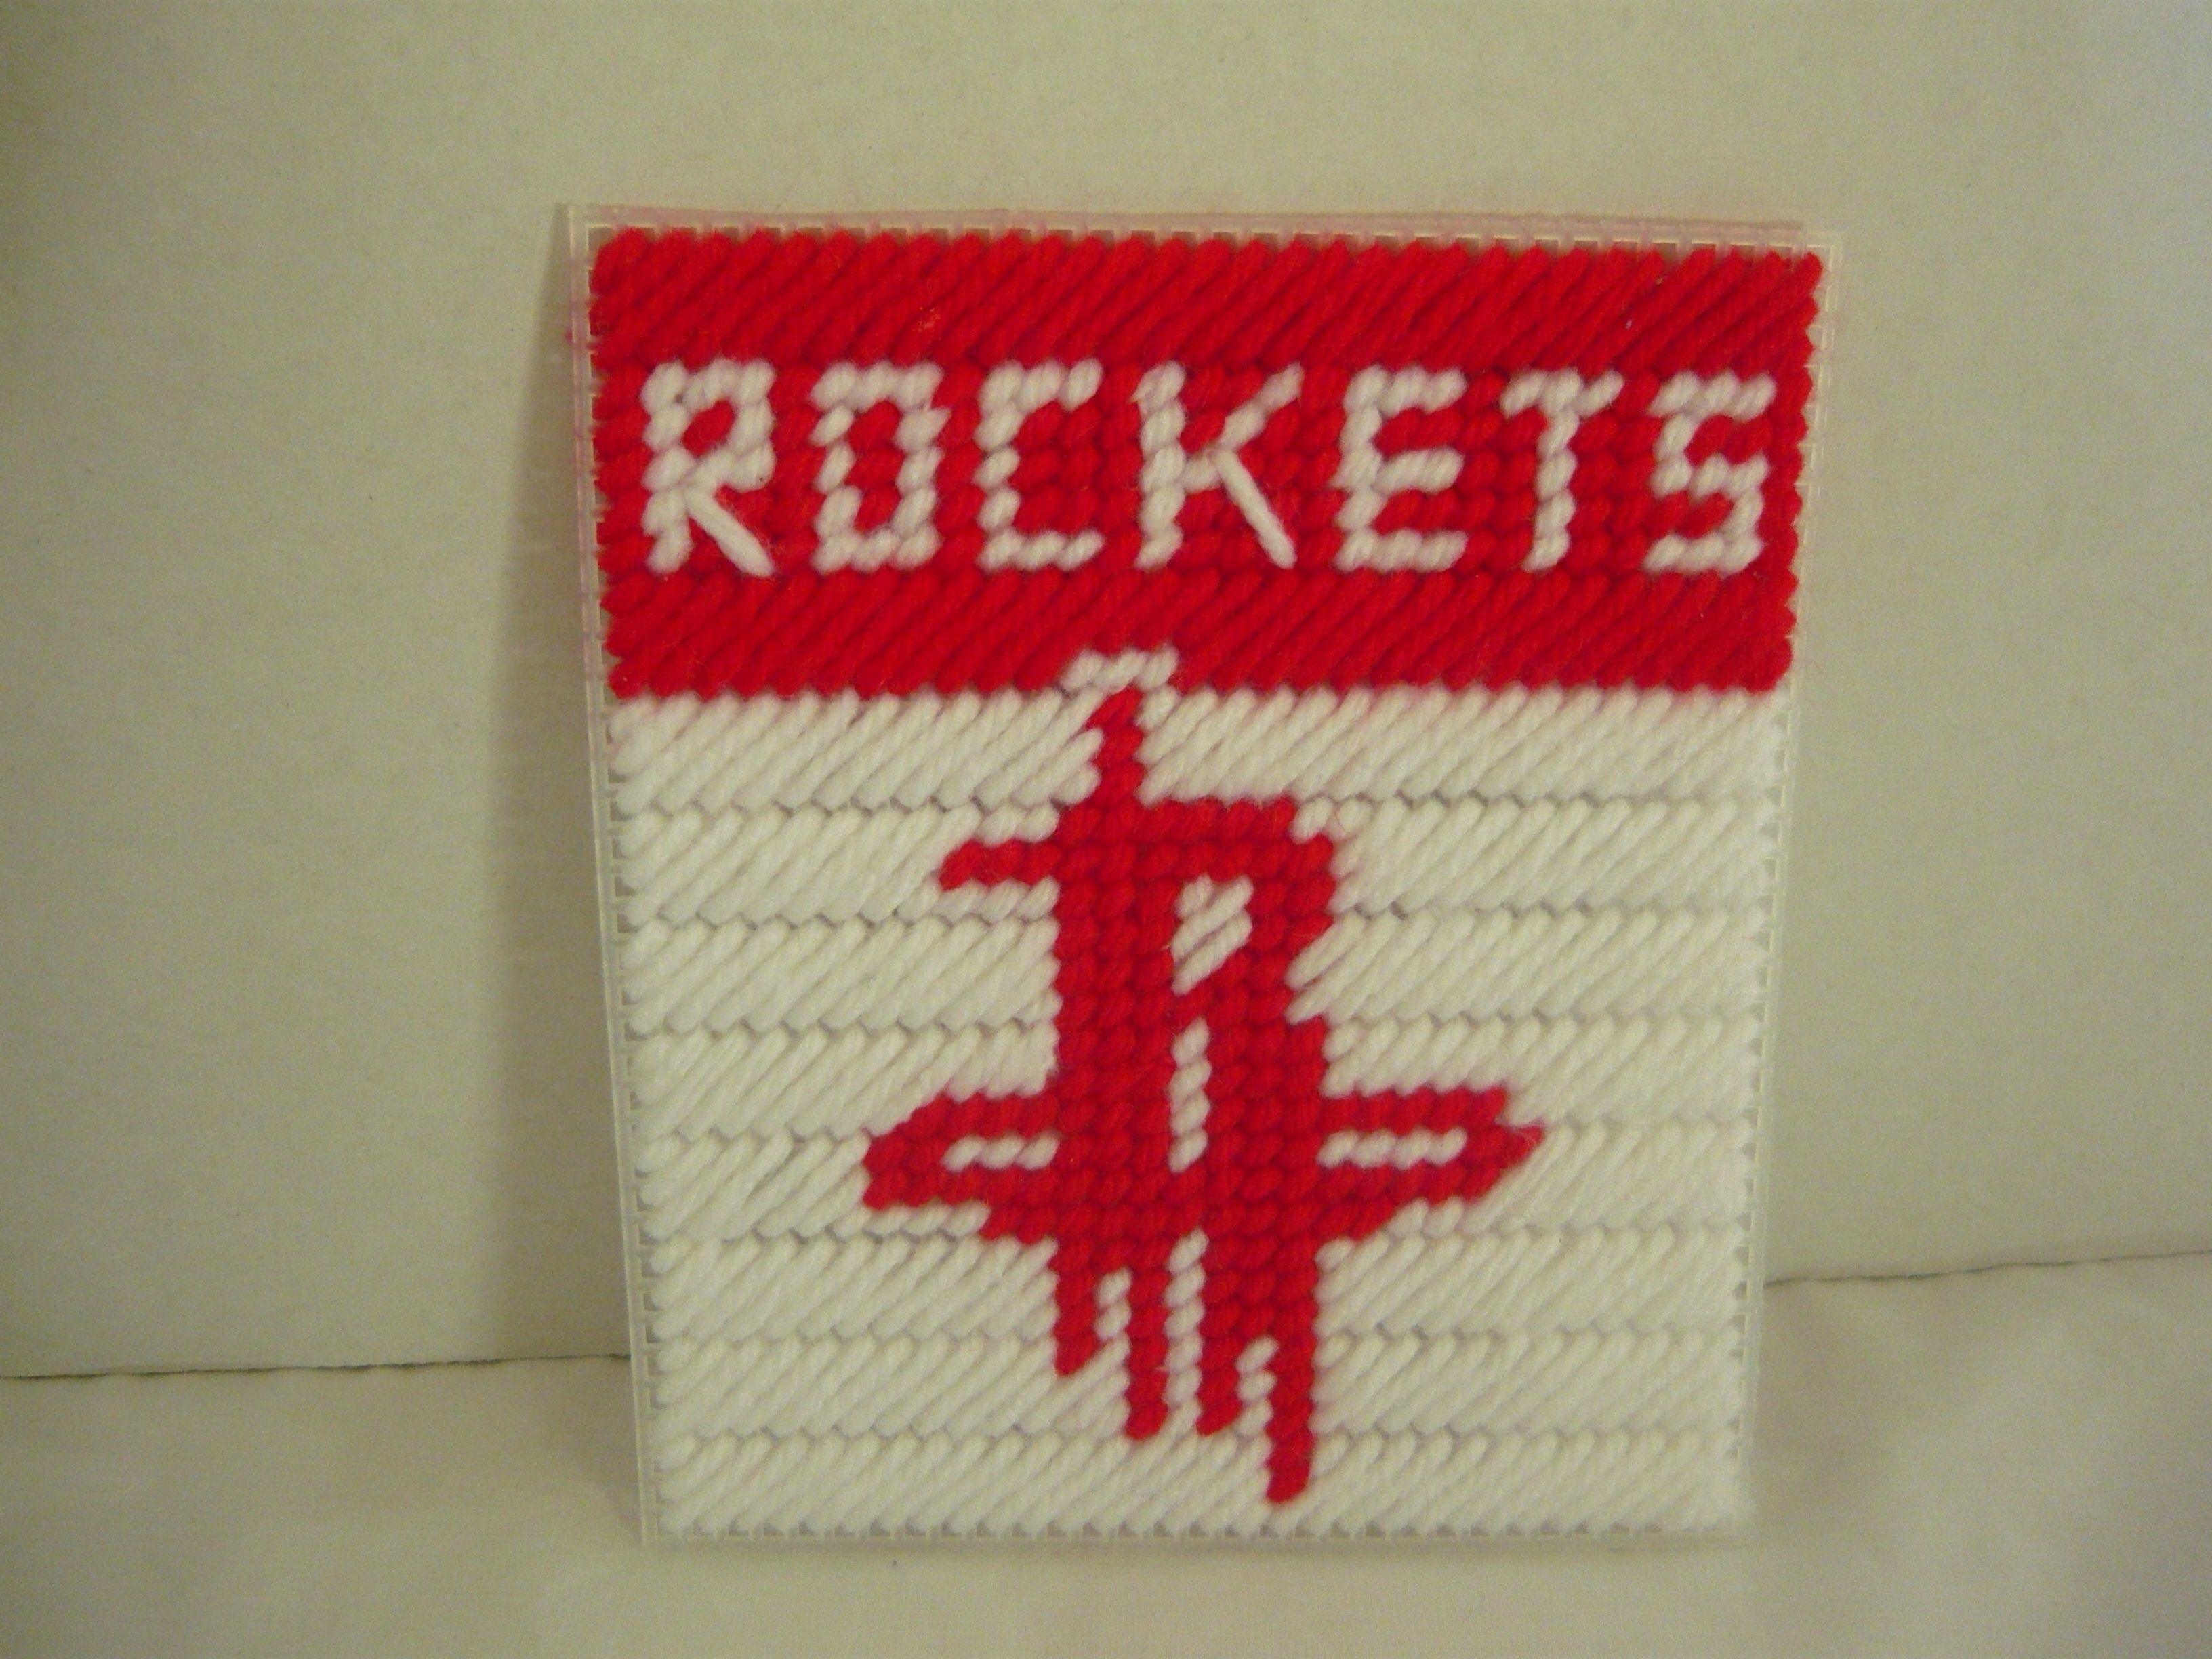 Houston Rockets Pro Basketball tissue box covers